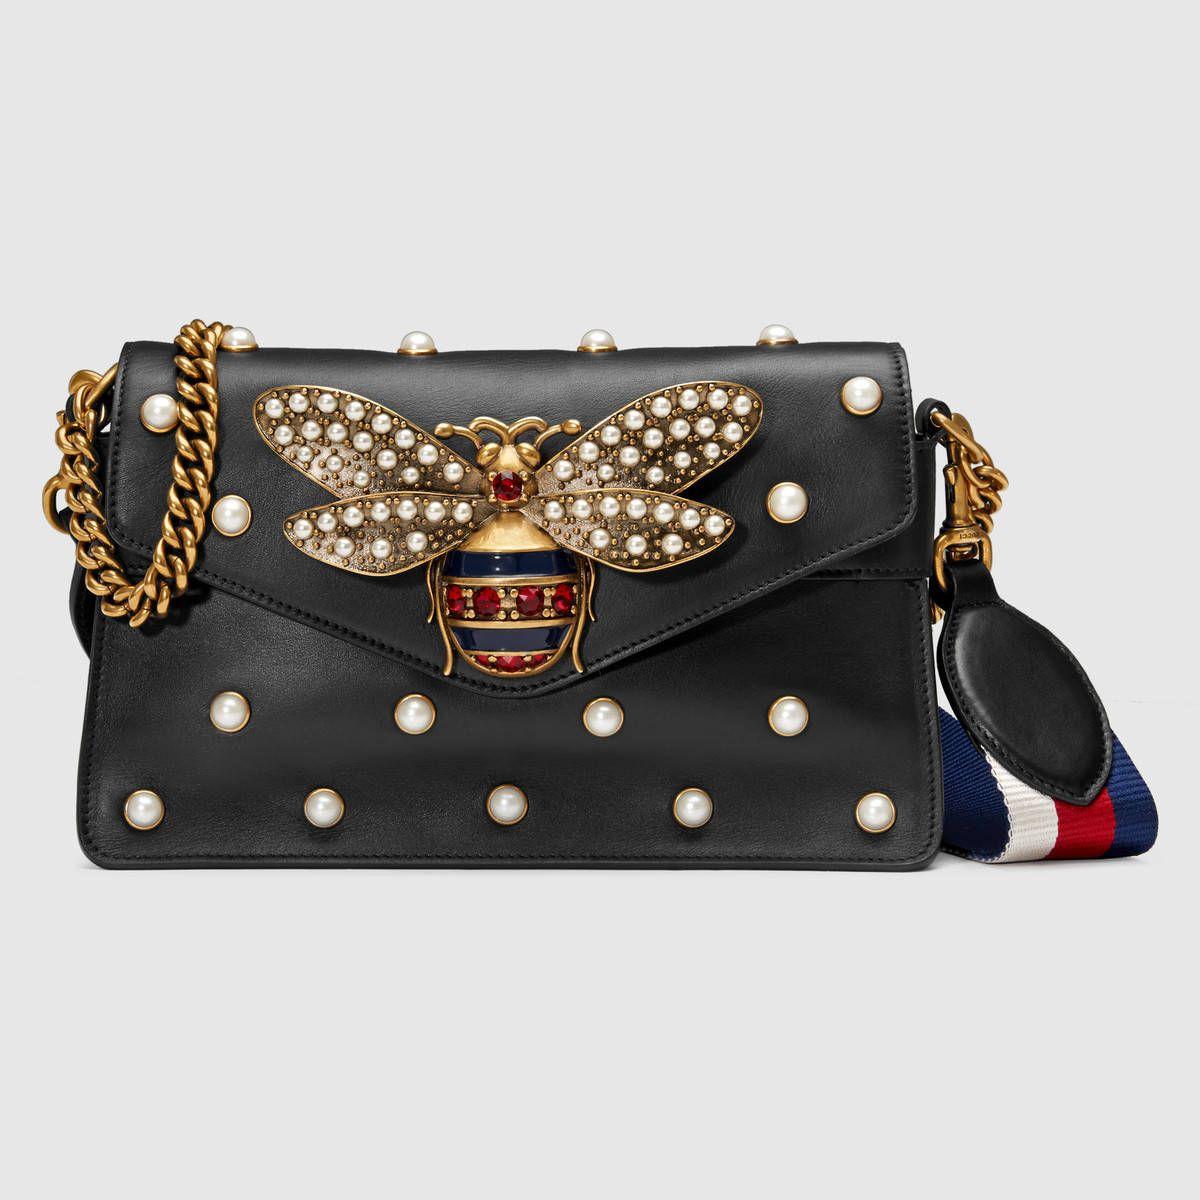 8b24adc1fc85 Broadway leather mini bag | purses/bags | Gucci shoulder bag, Gucci ...